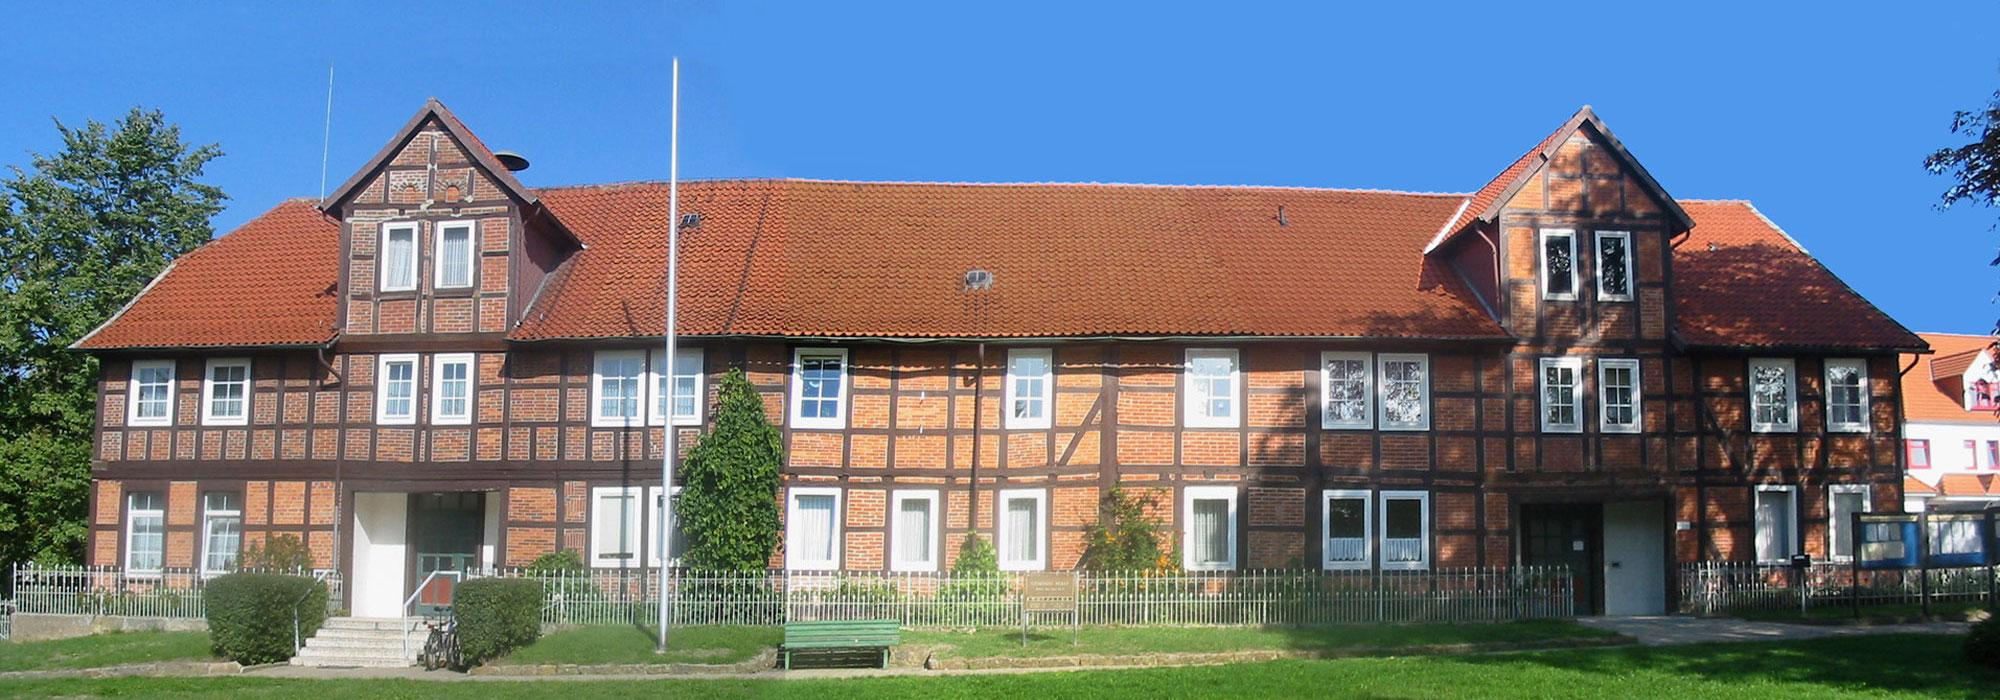 rathaus-holle-2